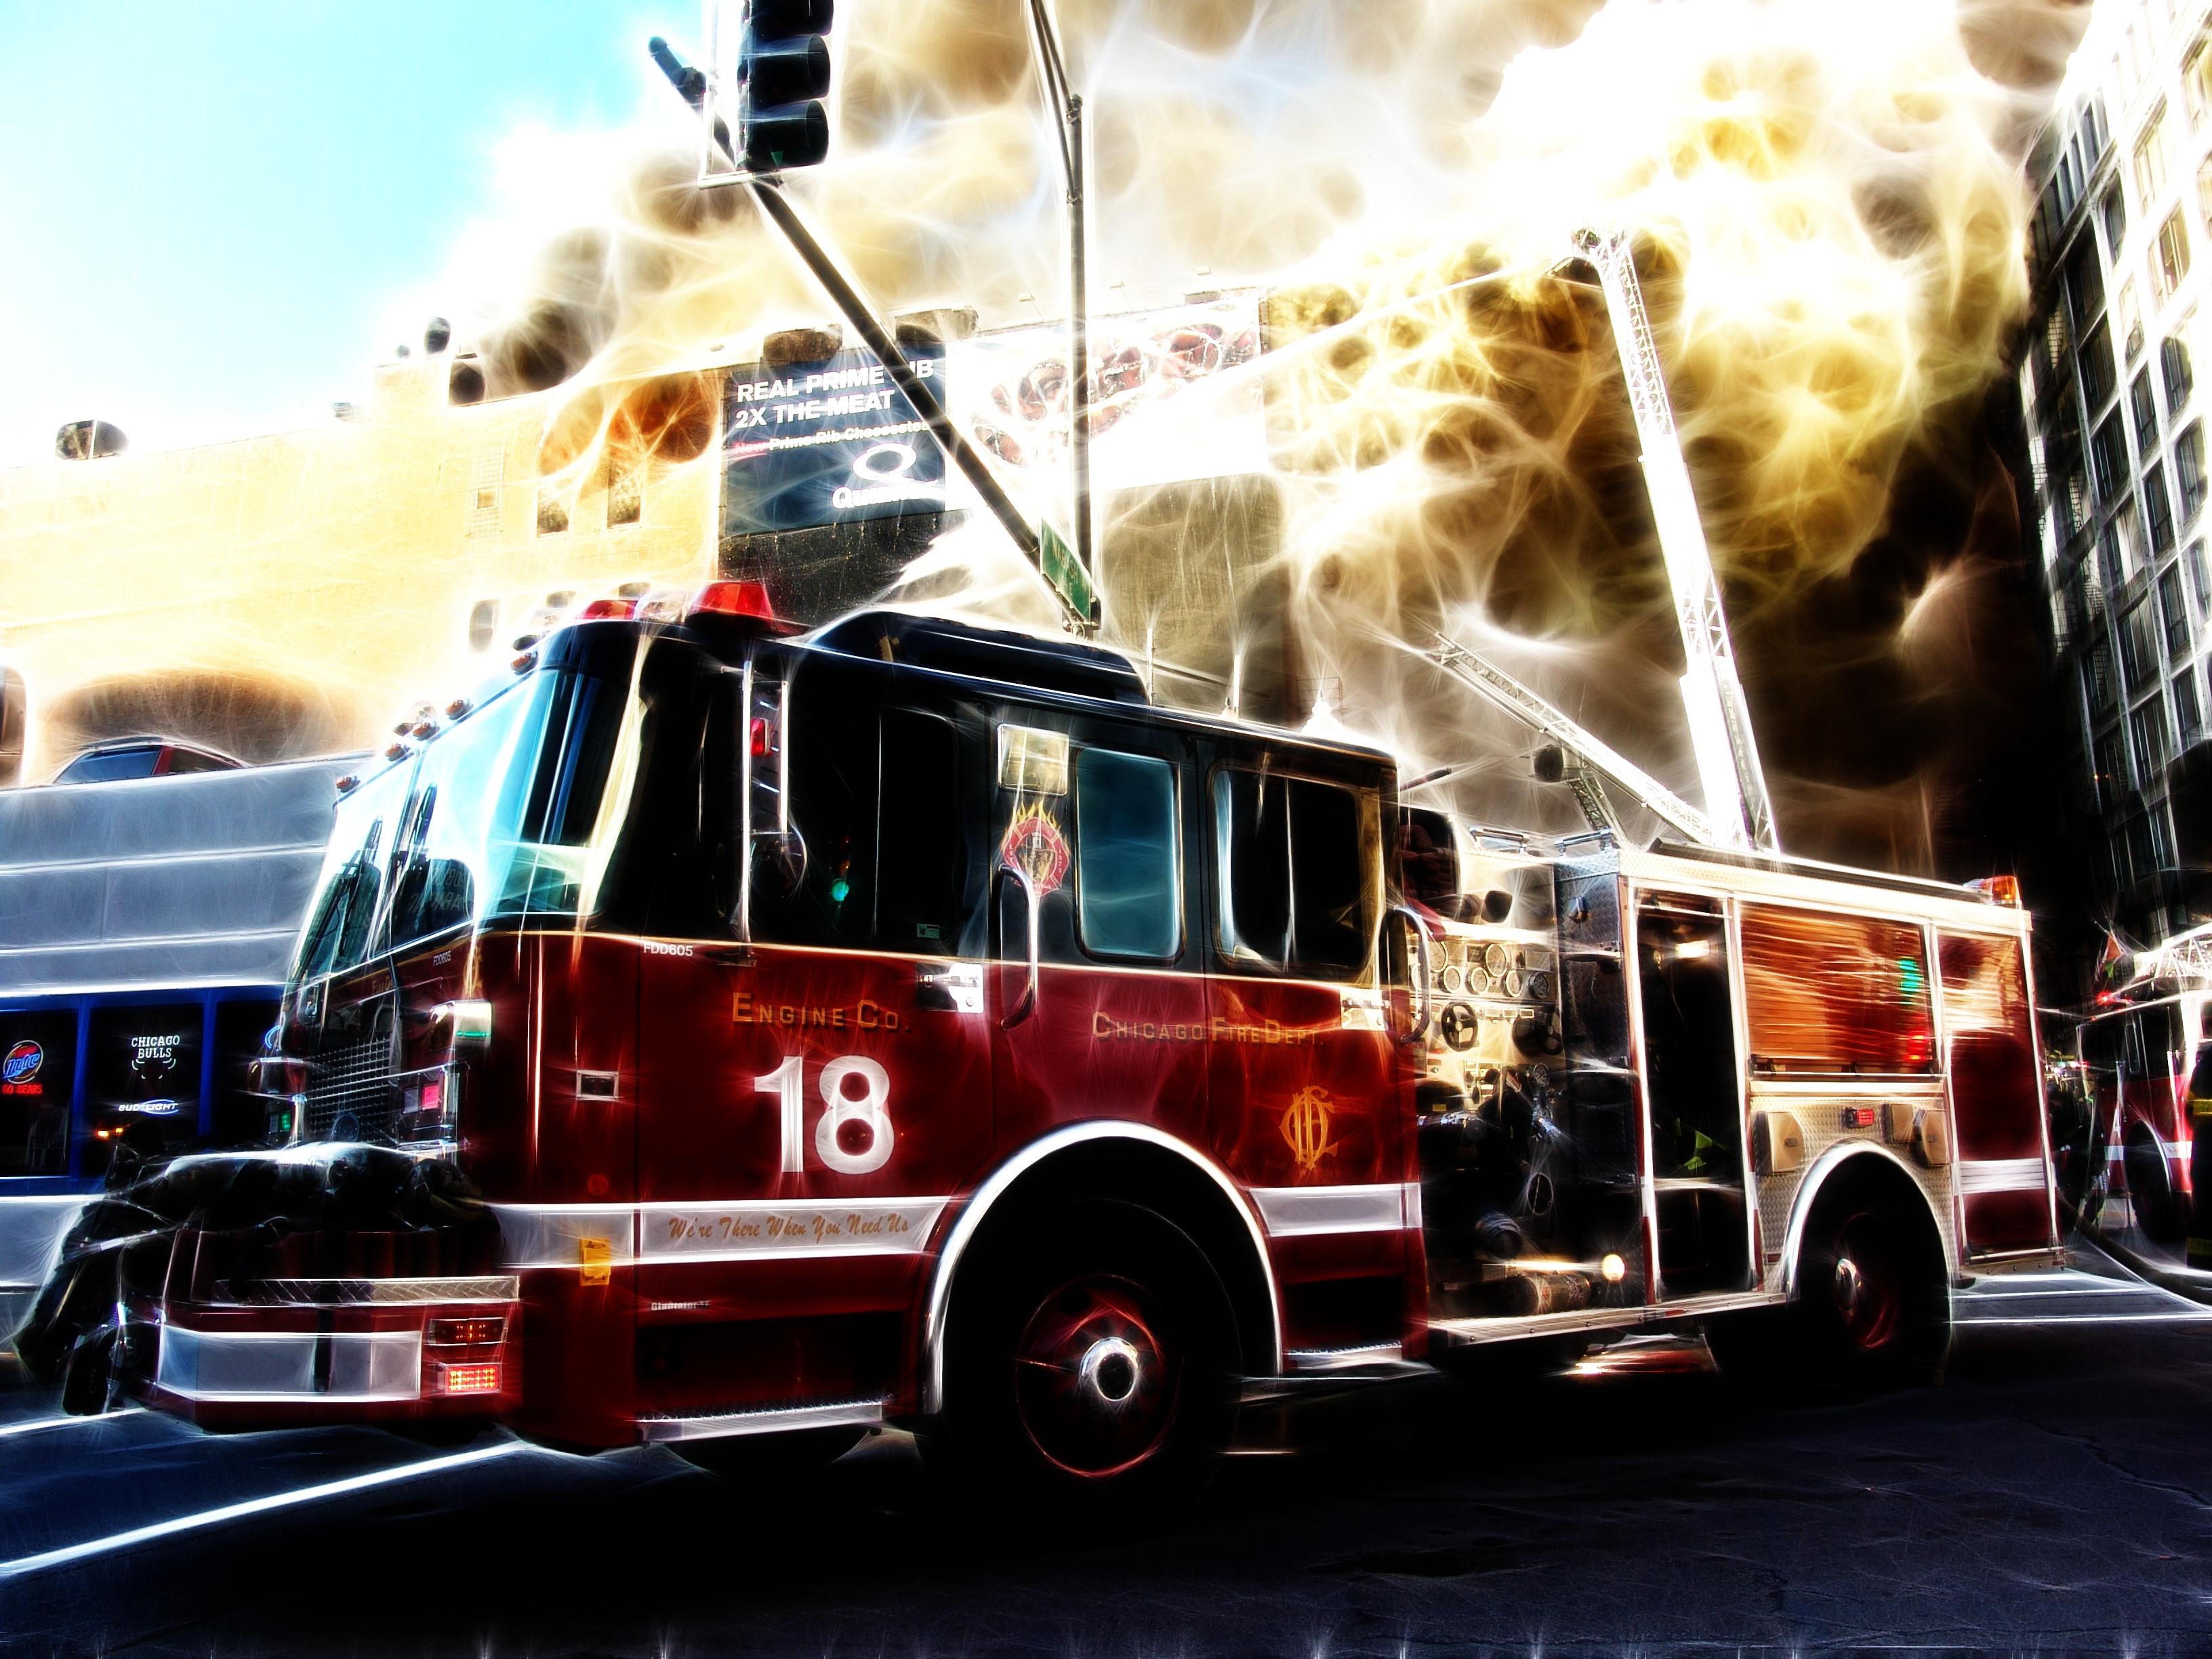 Wallpapers Firefighter Truck 1280 X 1024 203 Kb Jpeg HD Wallpapers 3264x2448